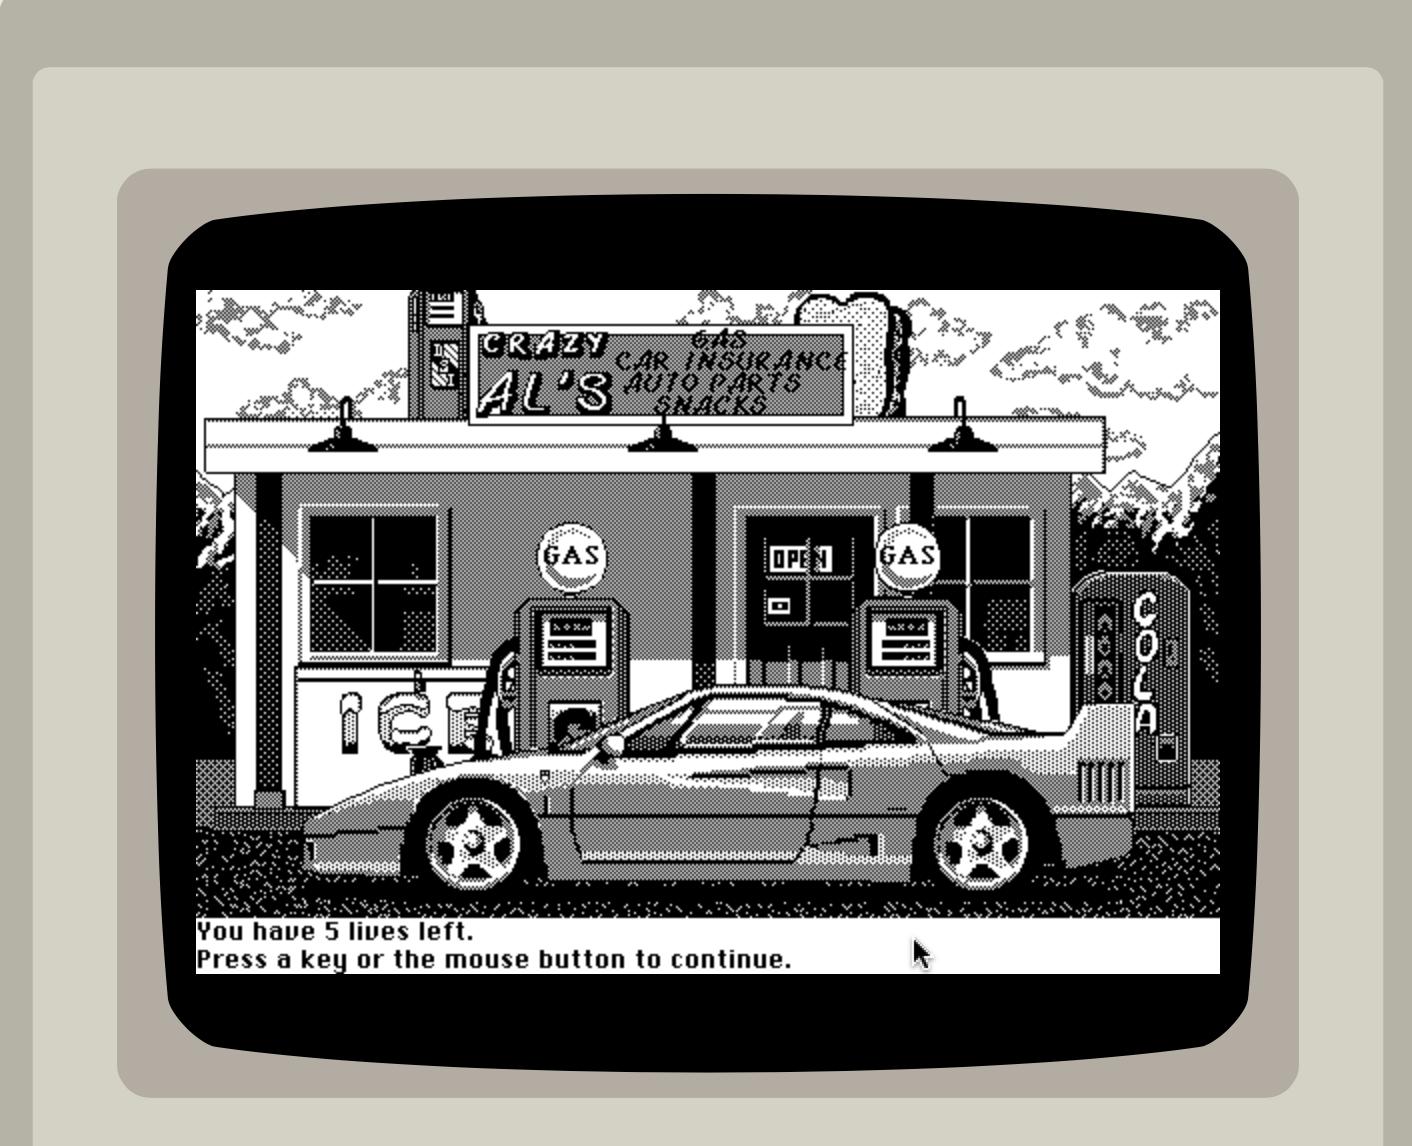 Mac 128k Test drive